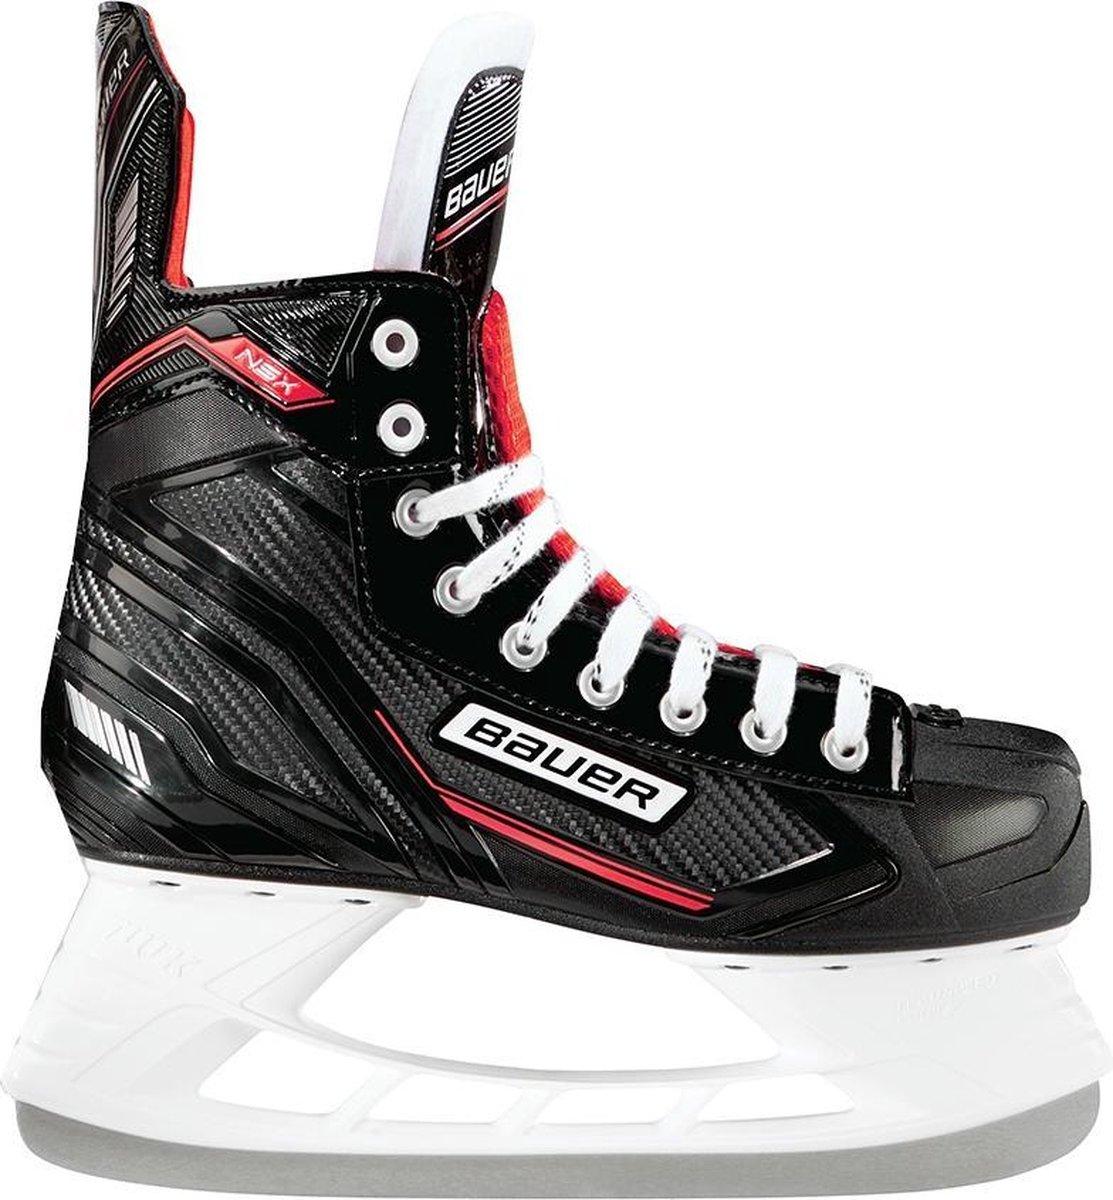 IJshockeyschaats Bauer NSX Skate Junior R-Schoenmaat 33,5